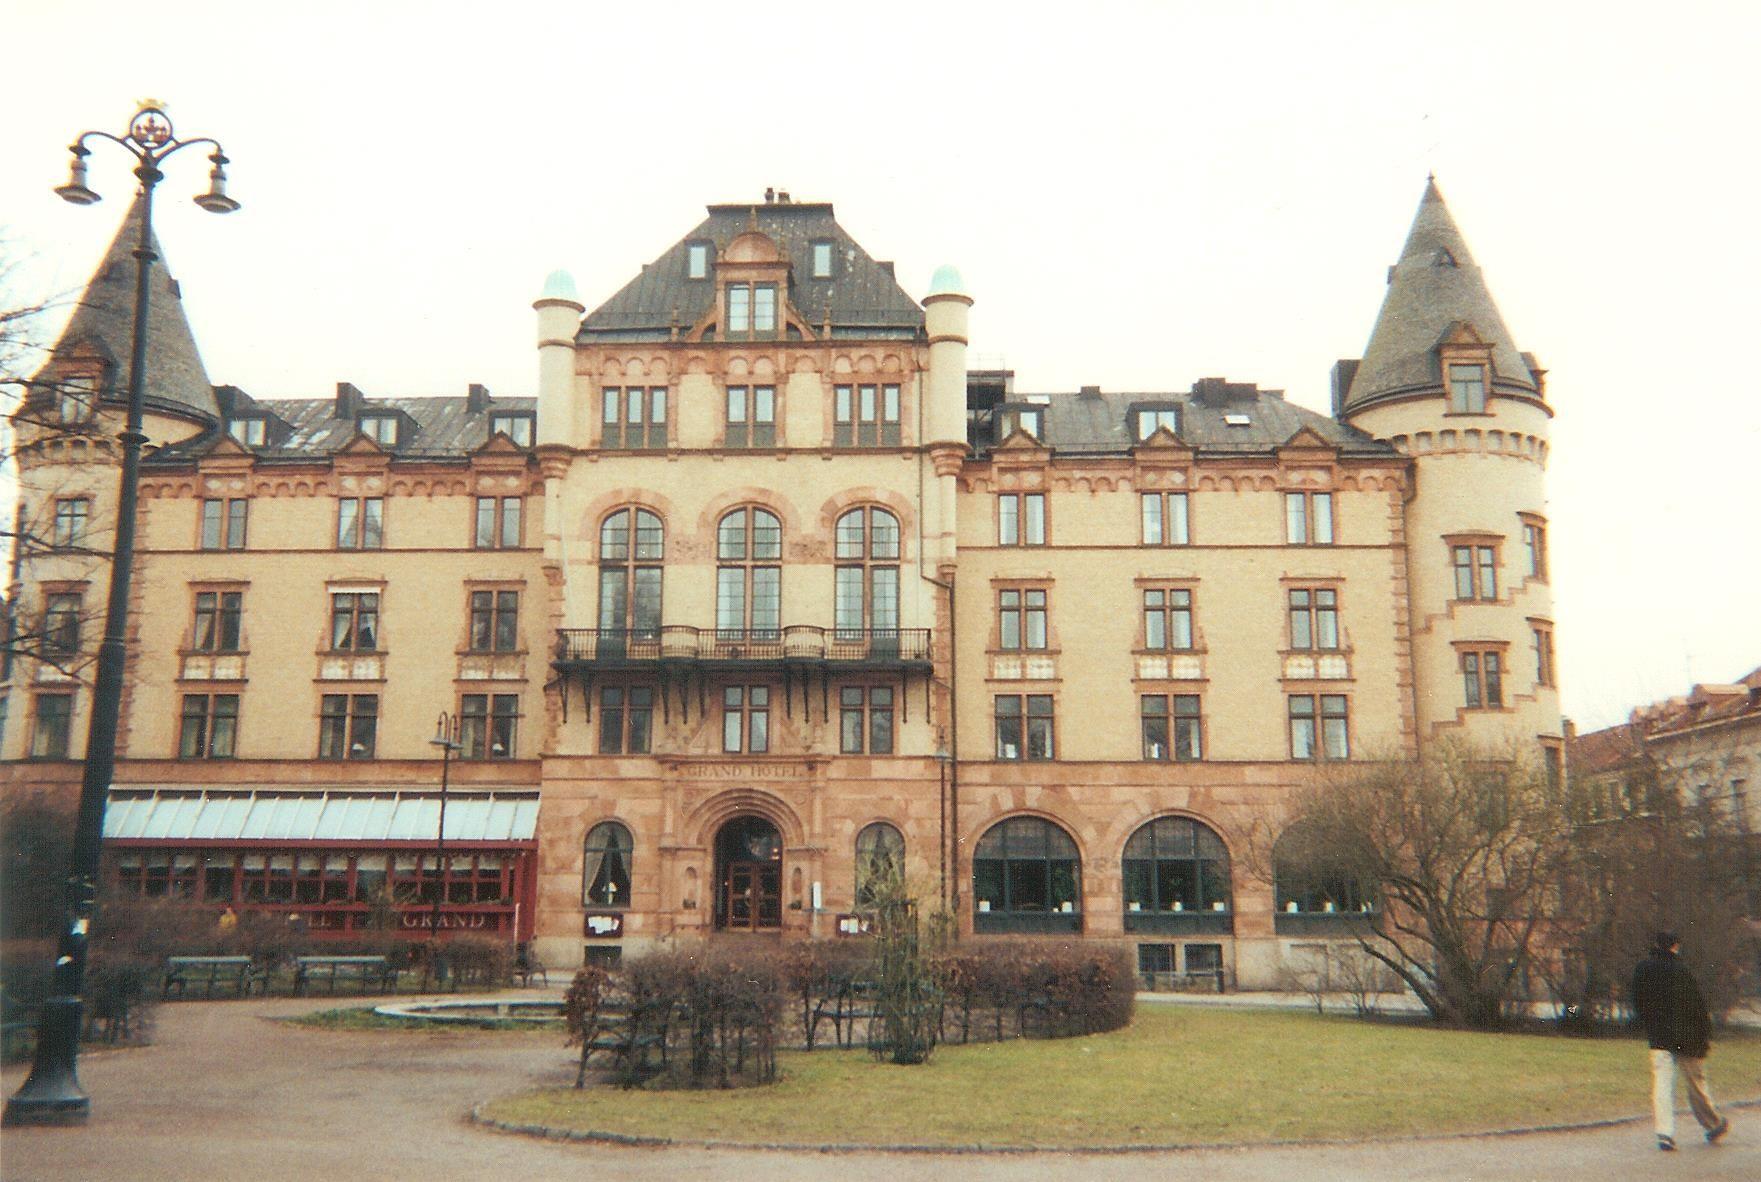 Grand Hotel Lund Sweden Amazing Real Estate